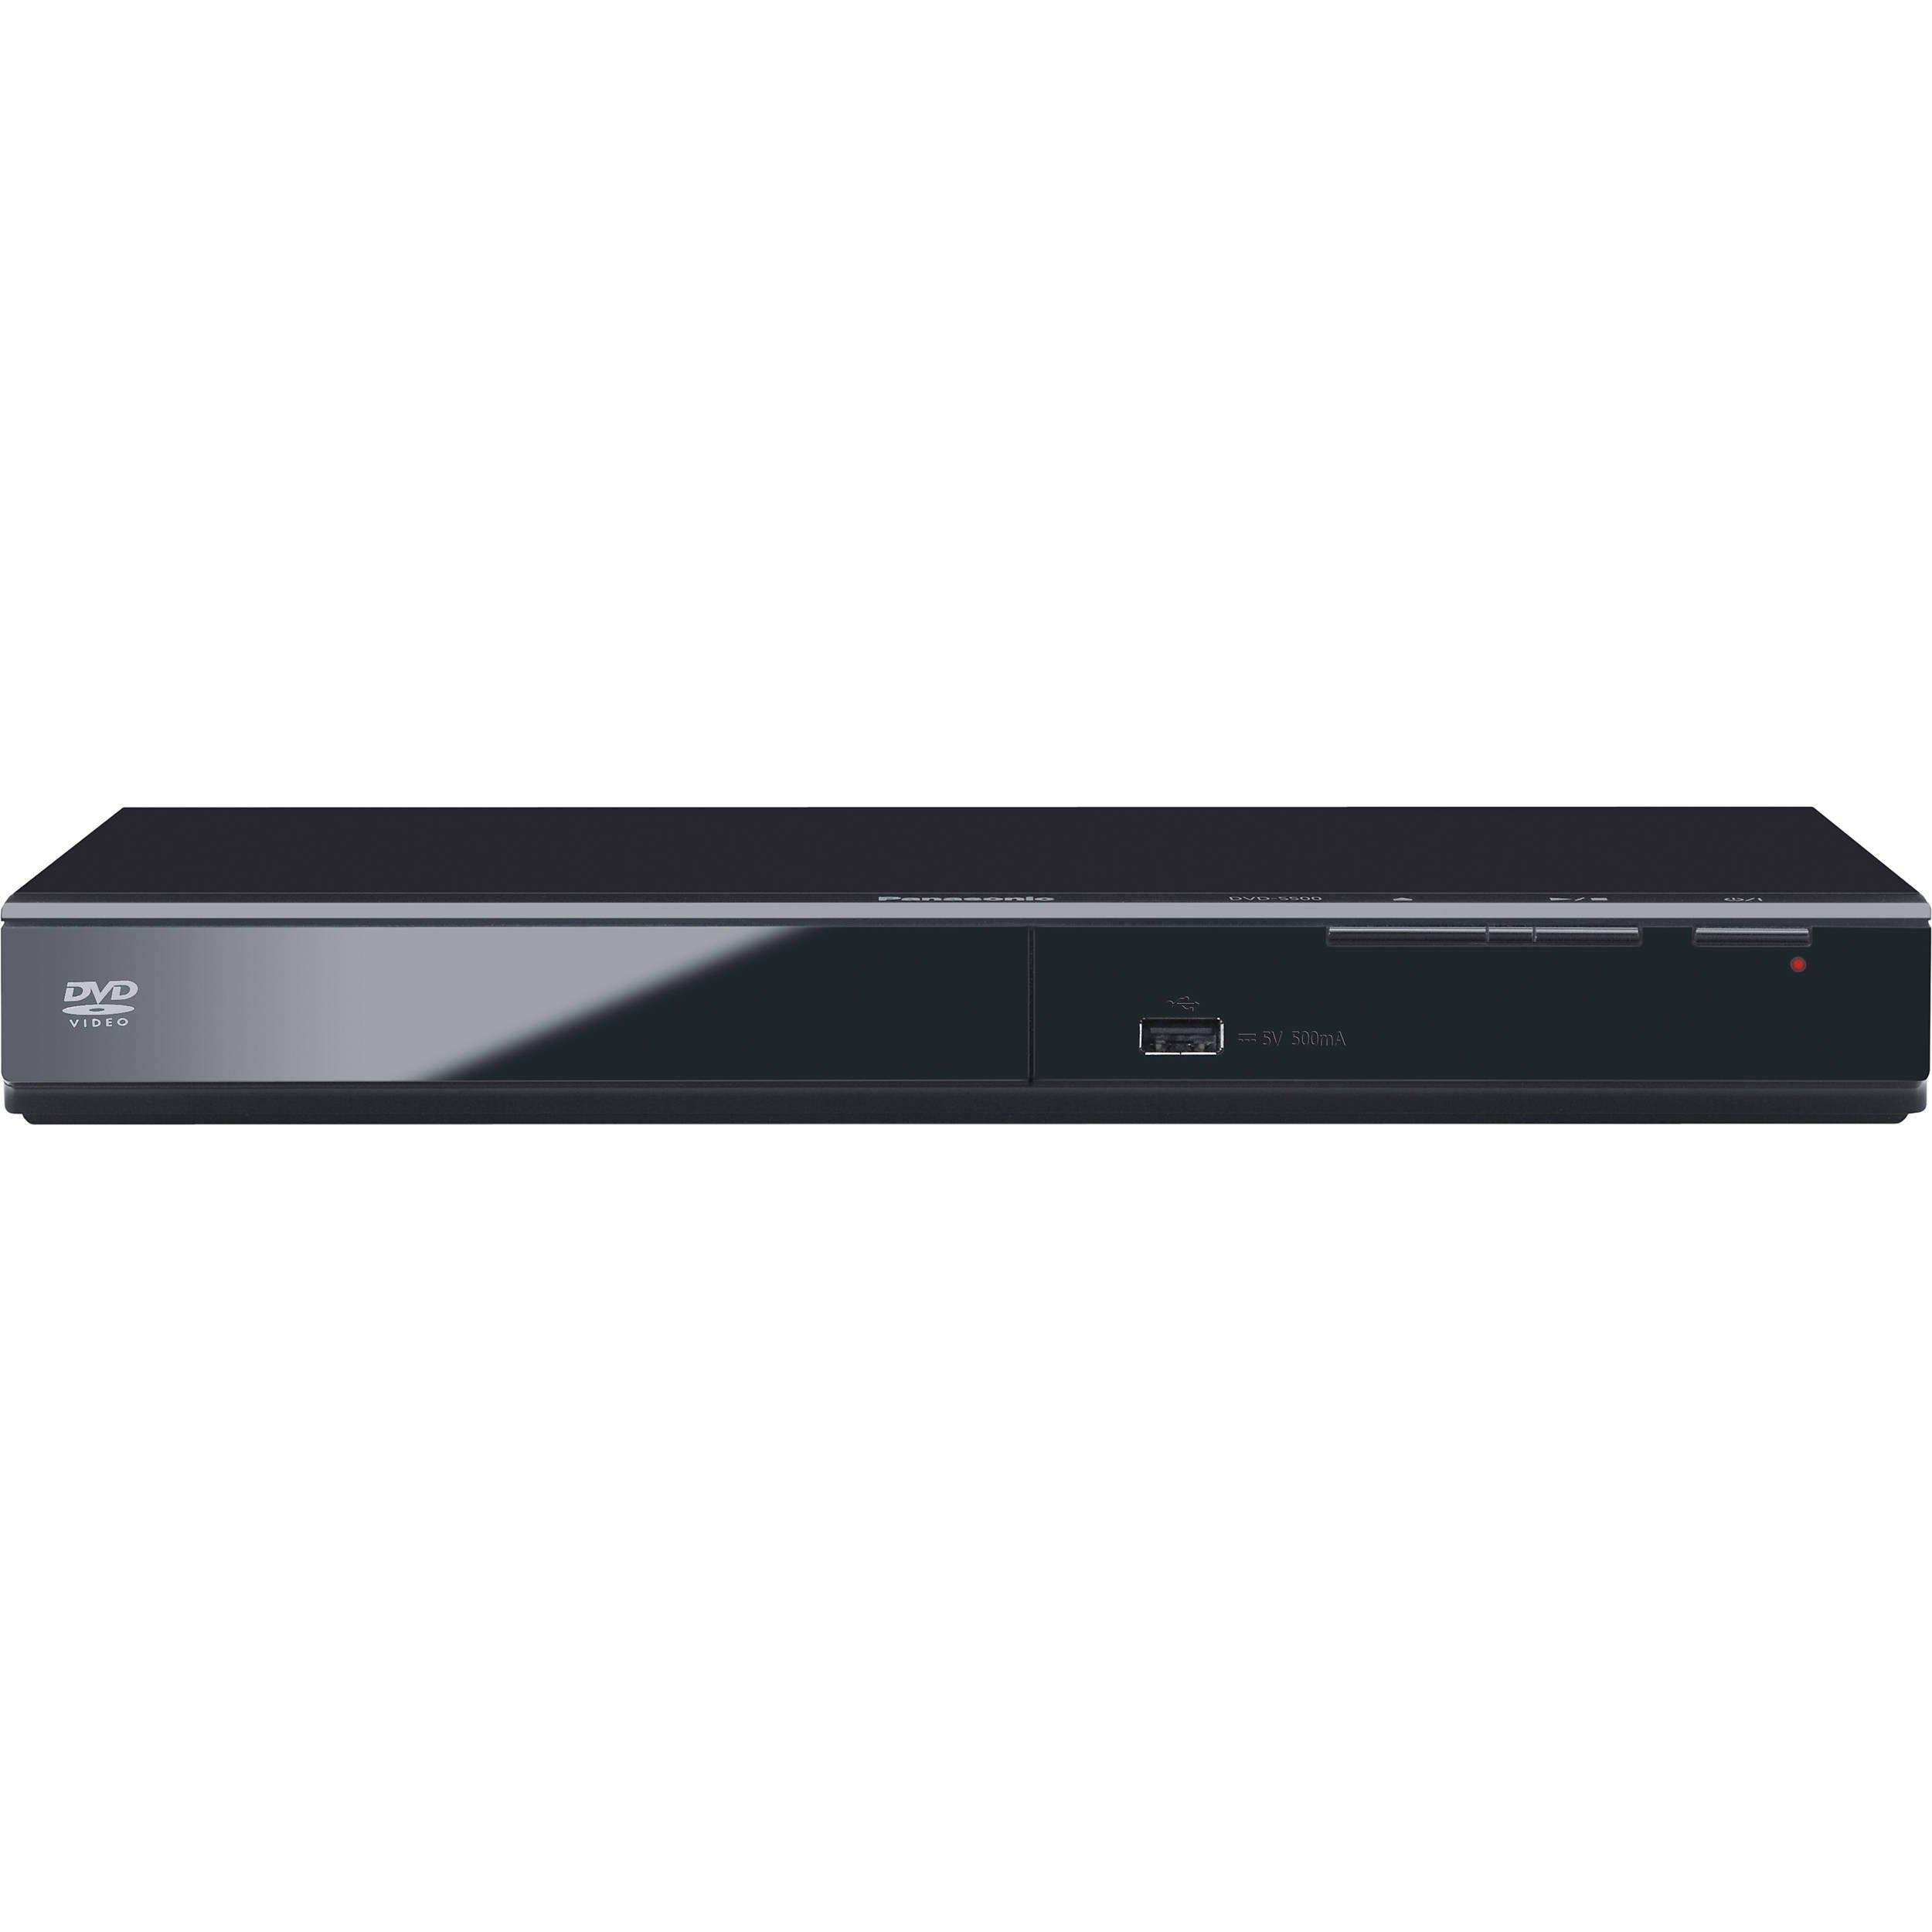 Panasonic Region Free Multi Zone DVD Player Plays 1 2 3 4 5 6 7 8 9 PAL NTSC With Remote control